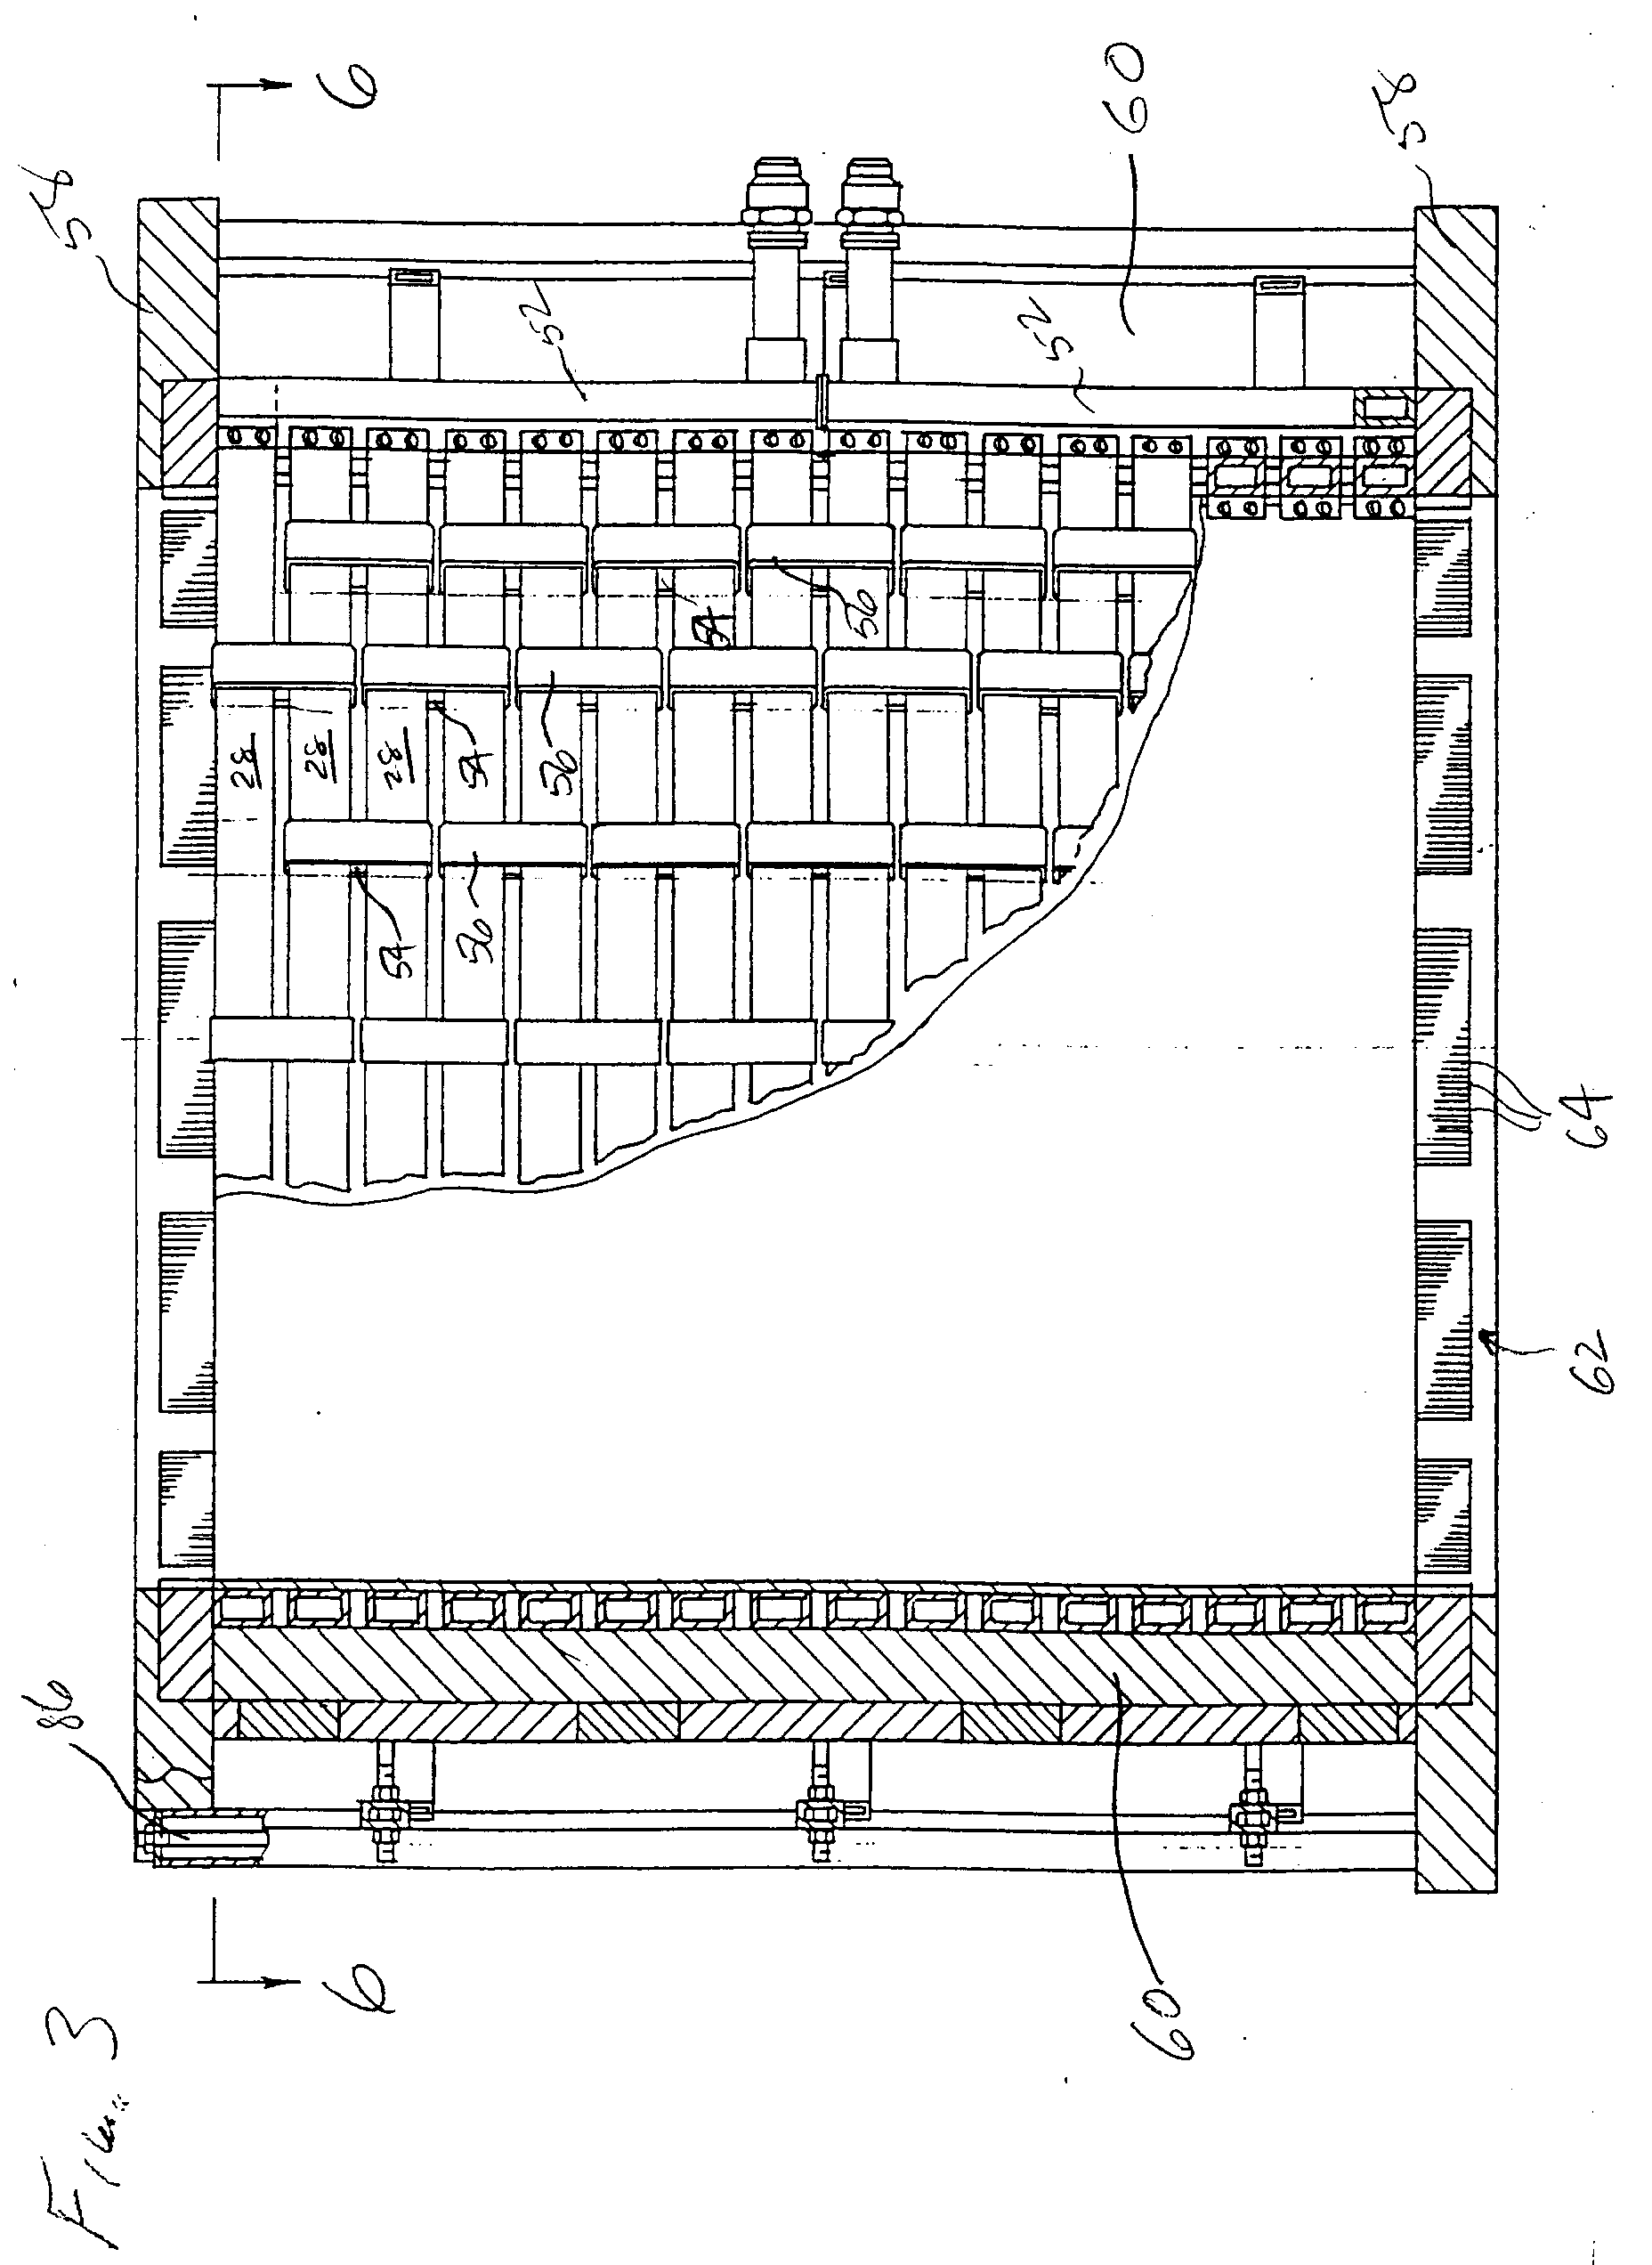 patent ep0858246a2